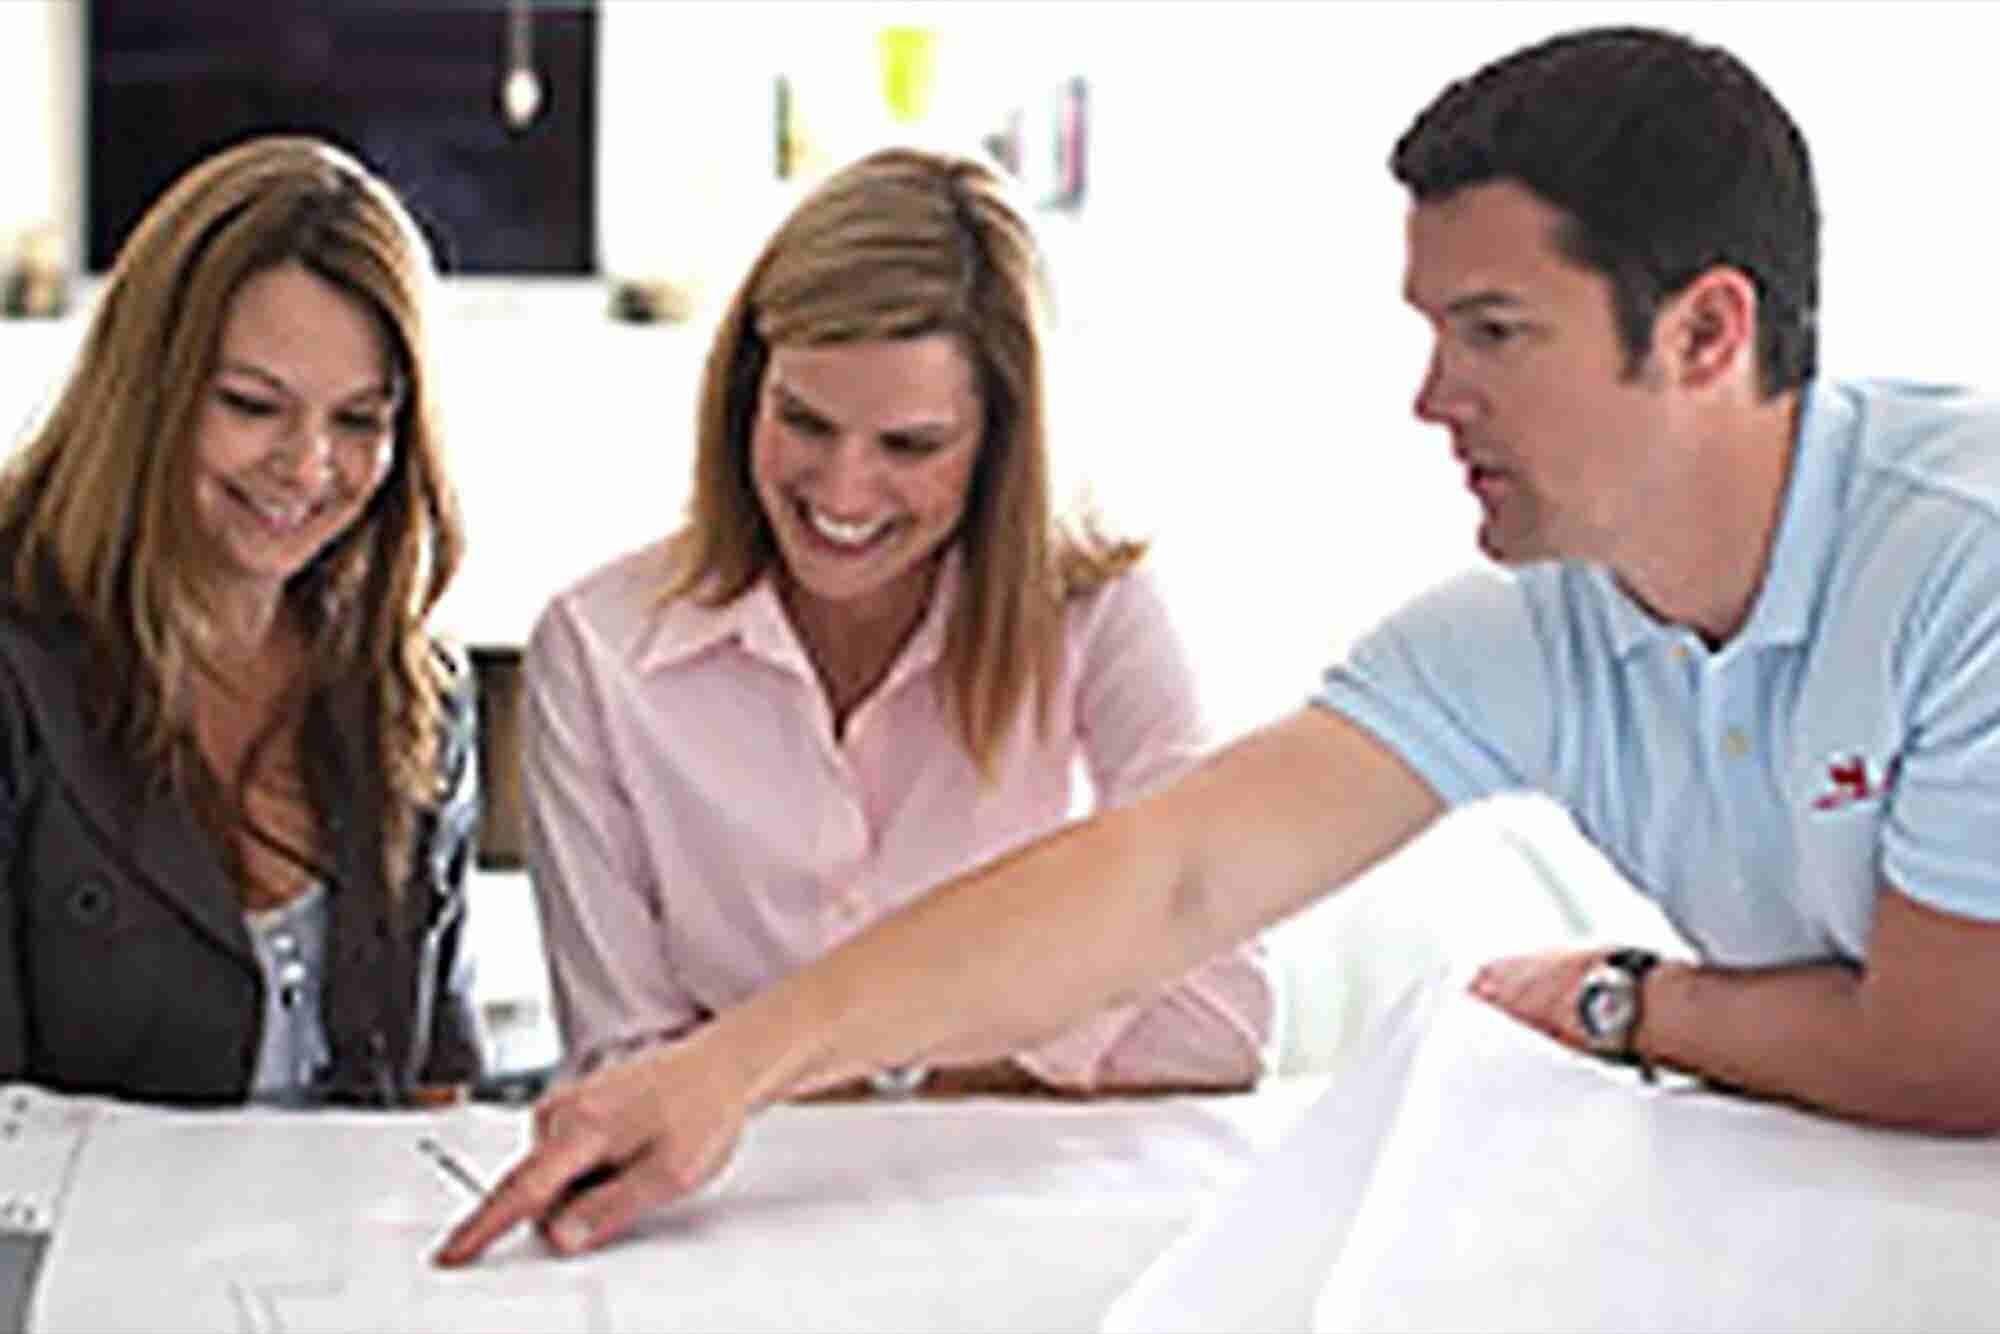 Home-Remodeling Businesses Get New Business Models